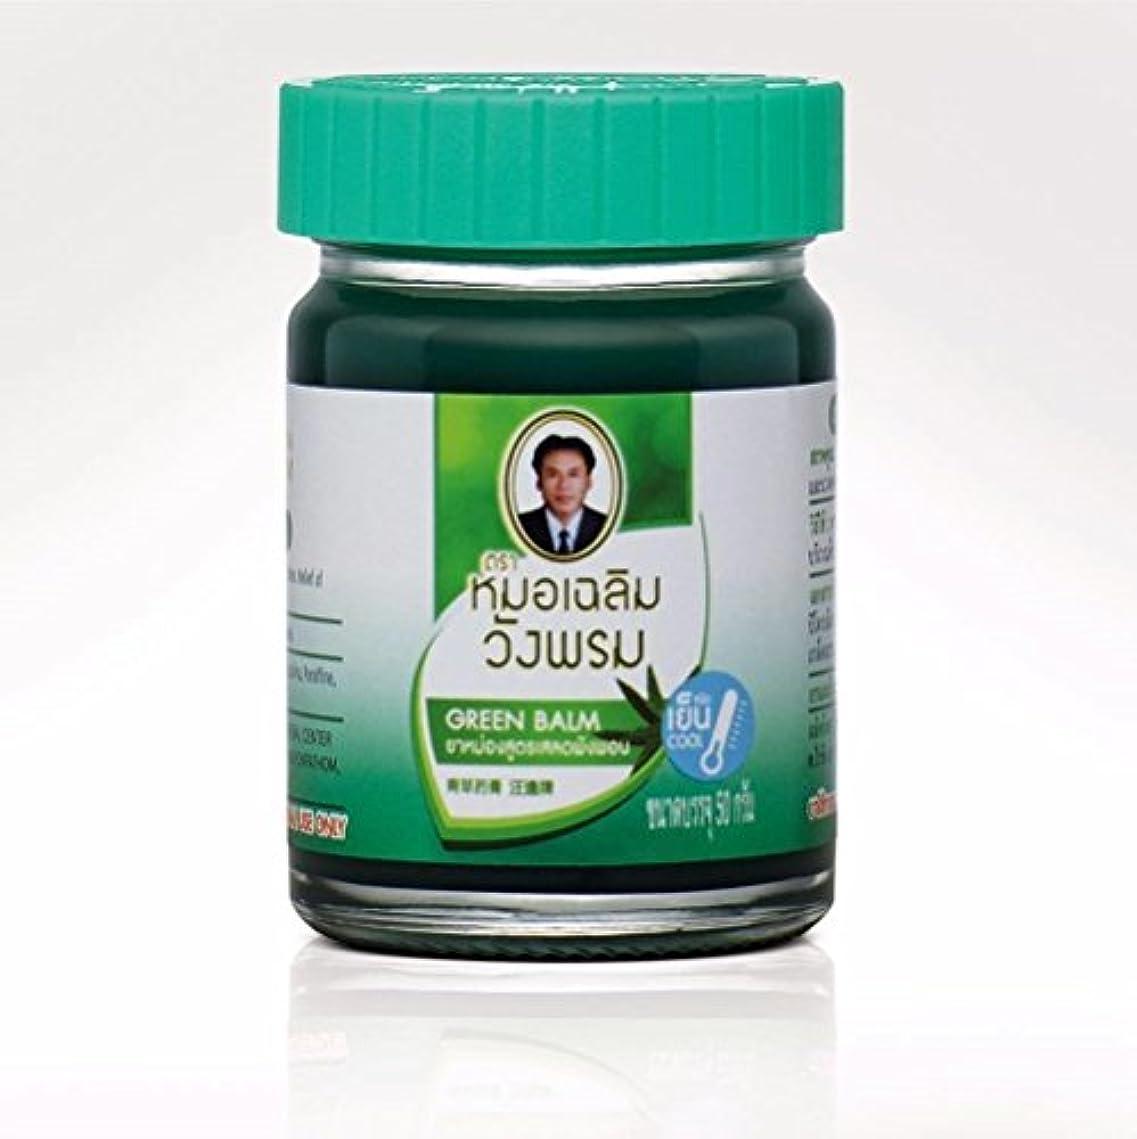 50G.Wangphrom Thai Herbal Balm Massage Body Relief Muscle Pain,Thai Herb Green Balm (COOL) size 50 gram..(2 pc.)